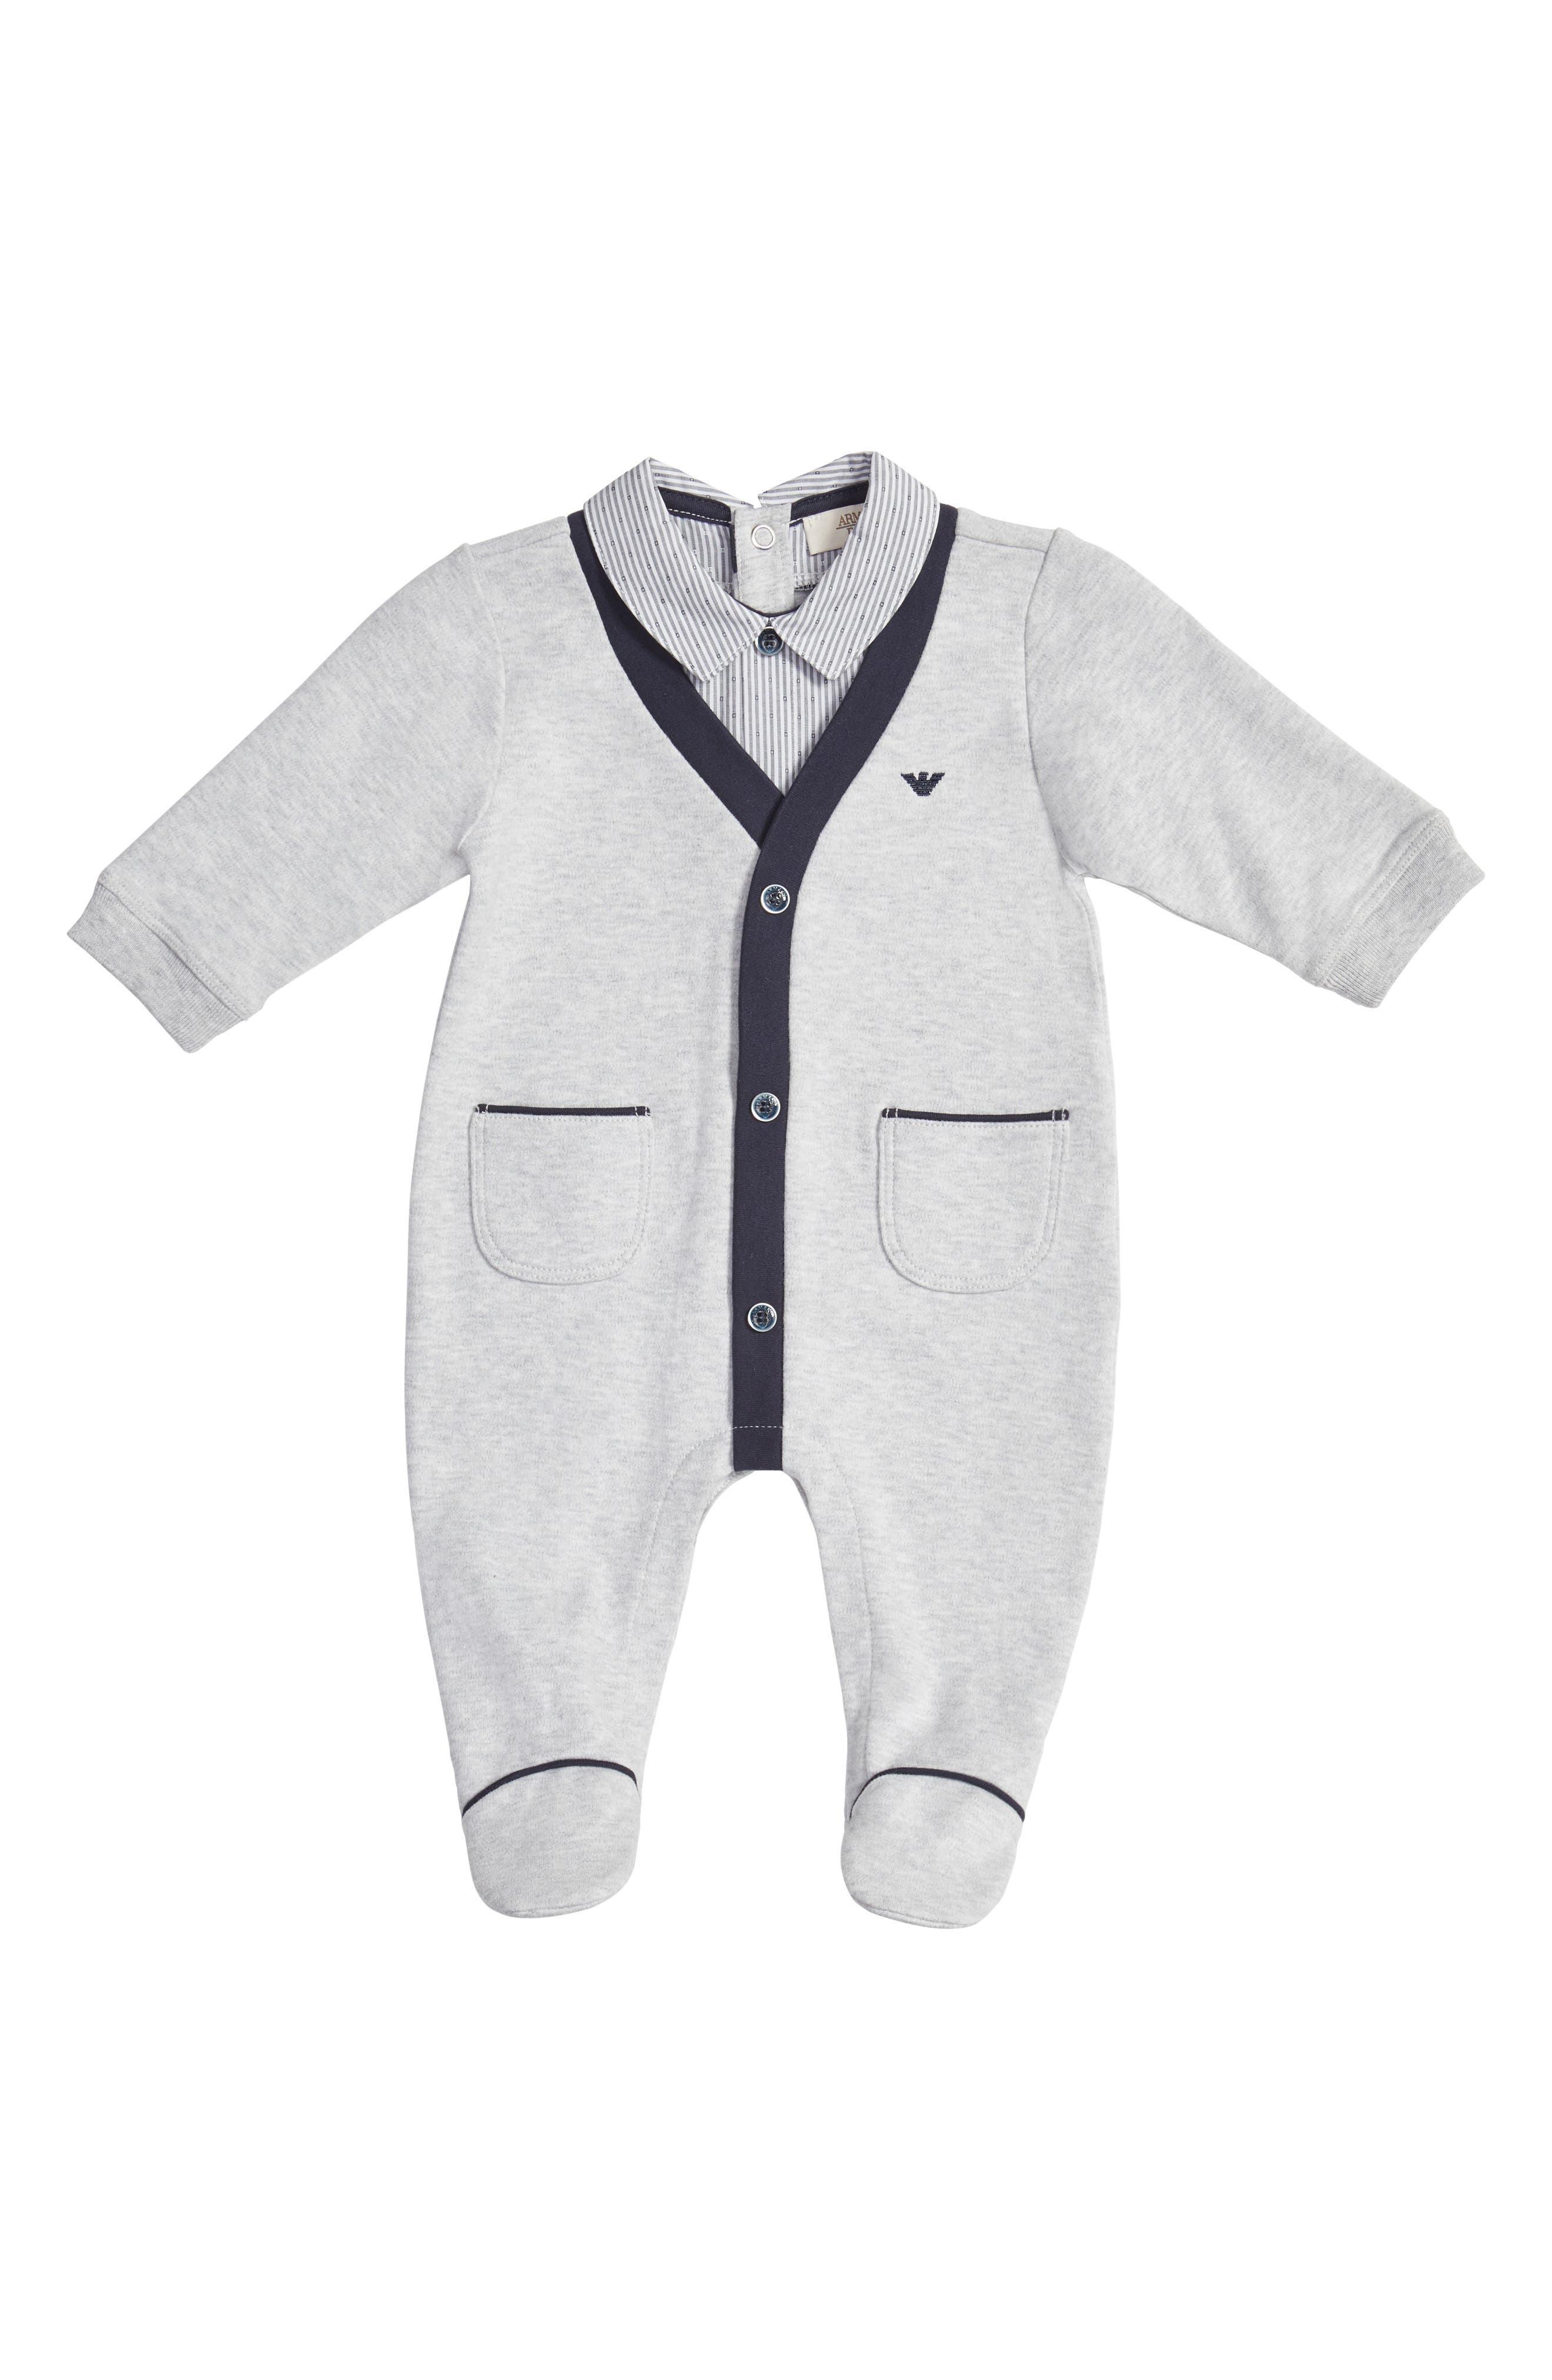 Alternate Image 1 Selected - Armani Junior Shirt & Cardigan Footie (Baby Boys)